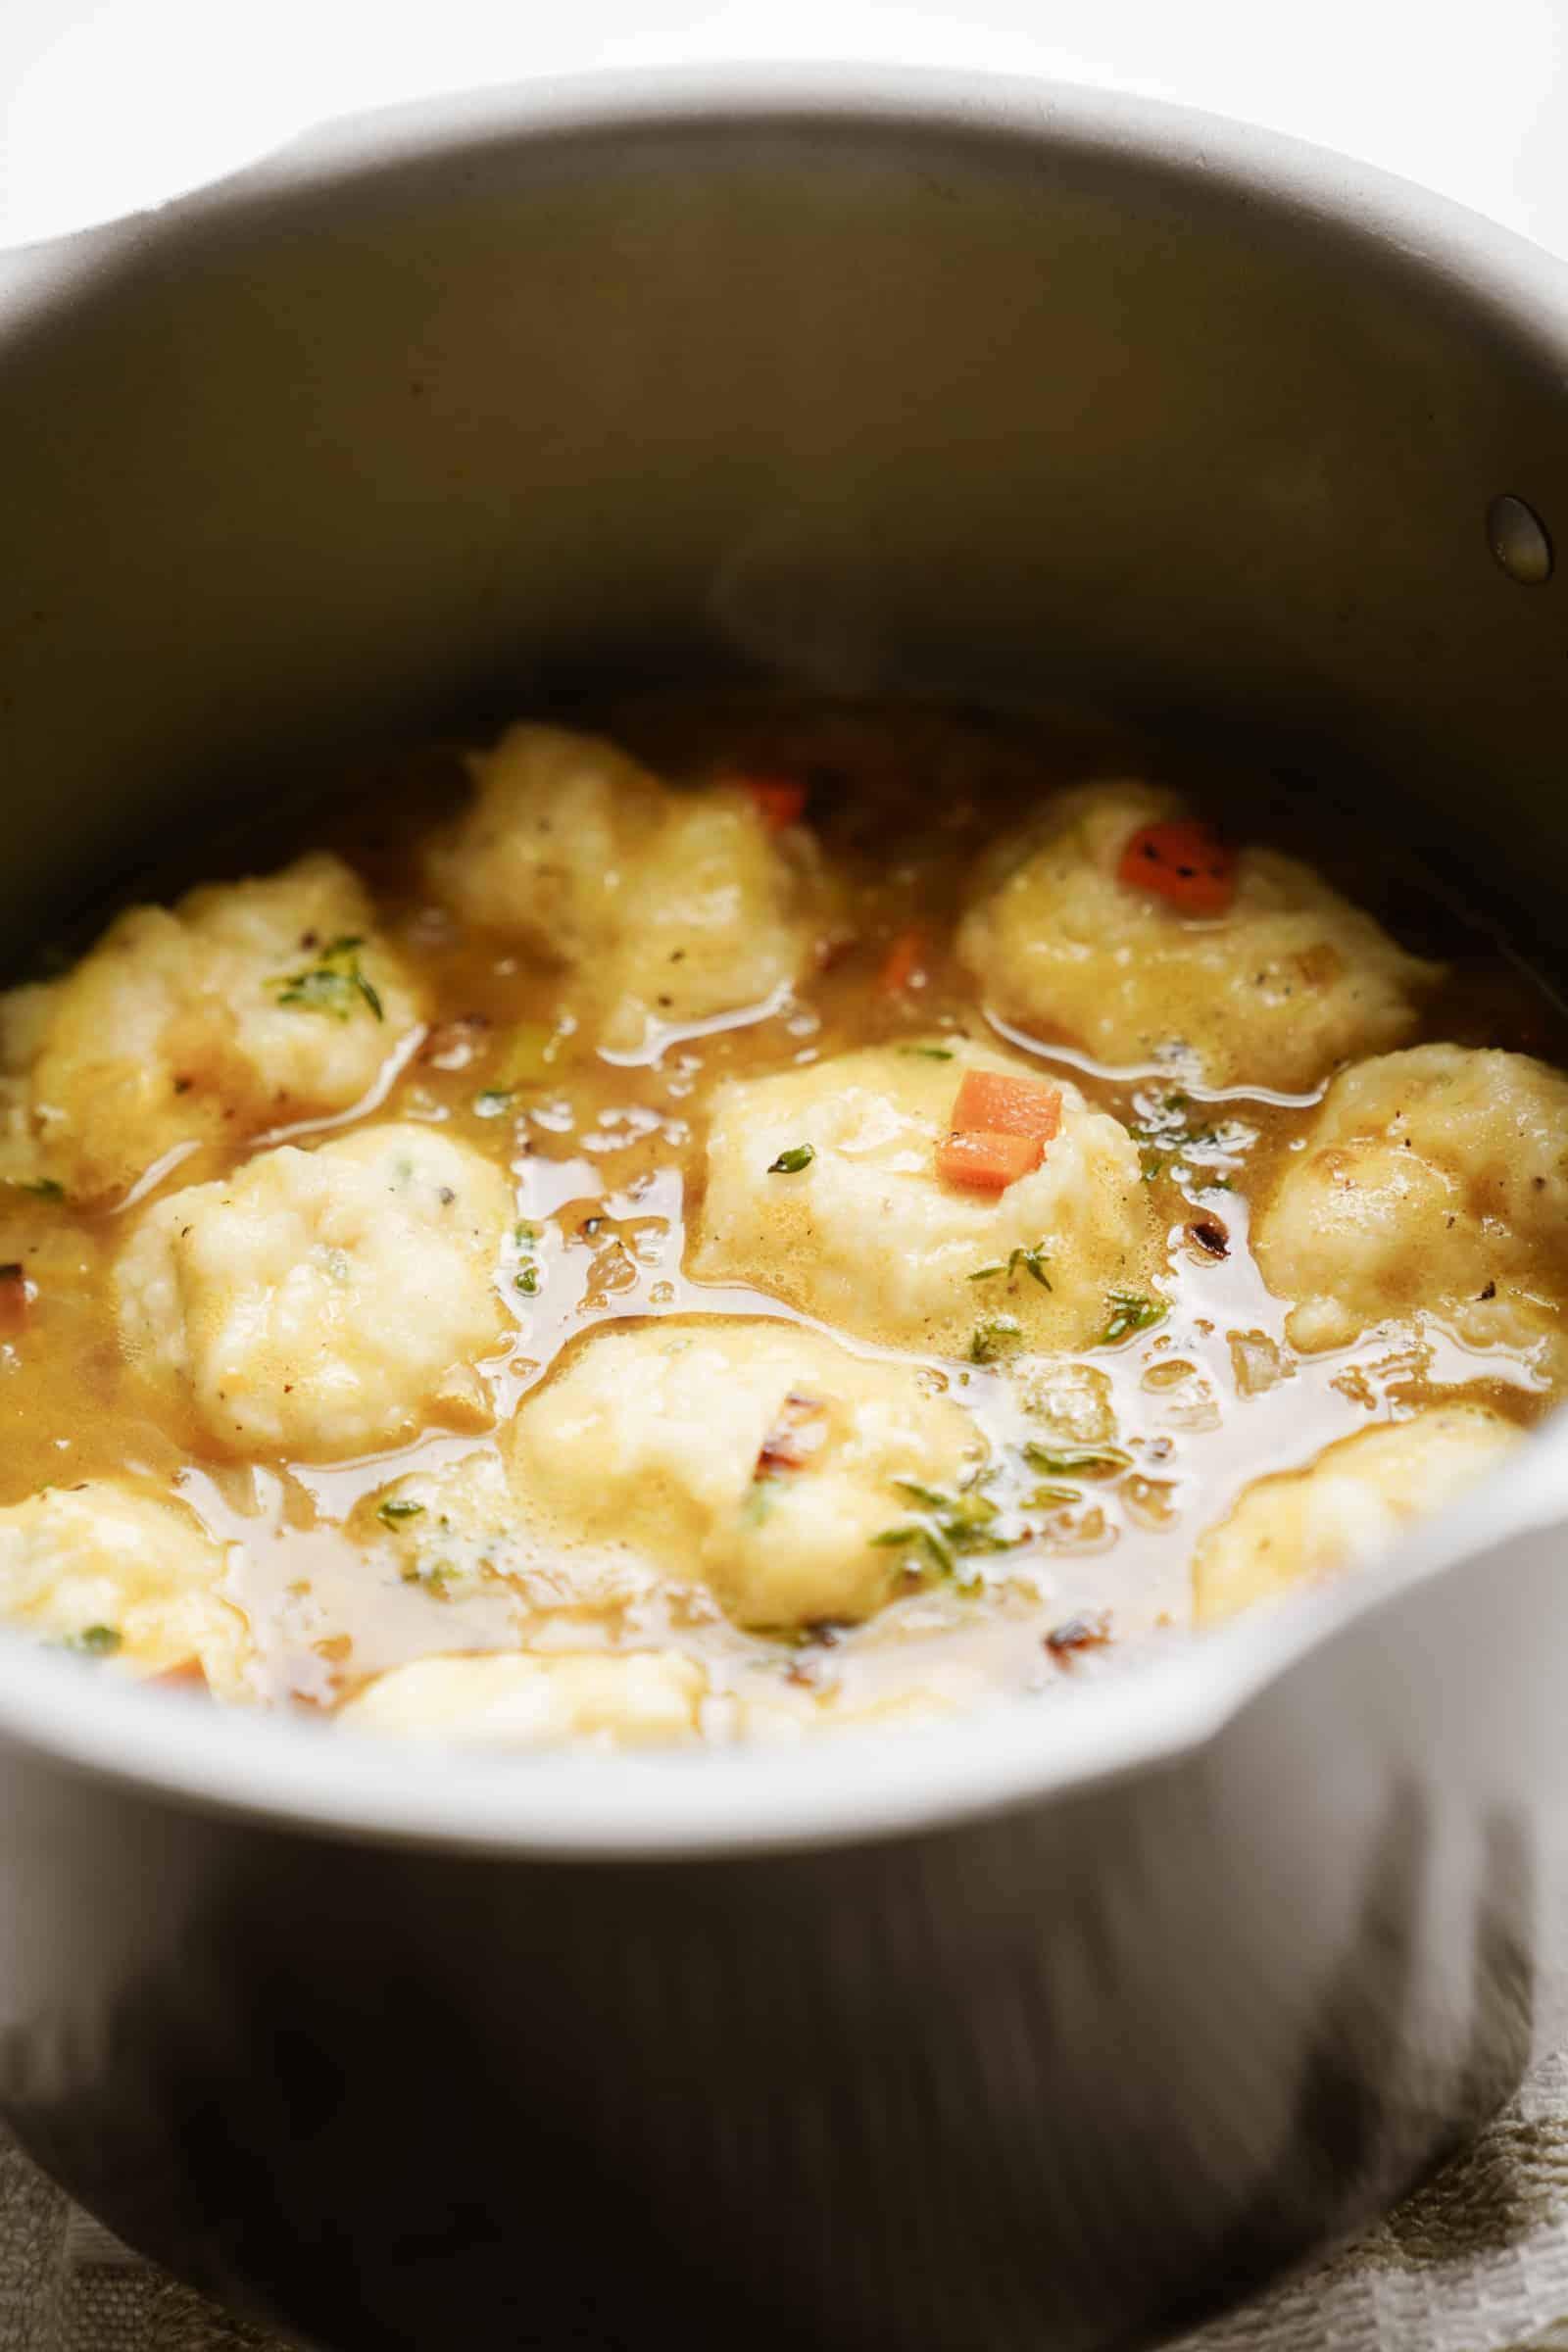 Vegan dumplings in a pot of soup cooking